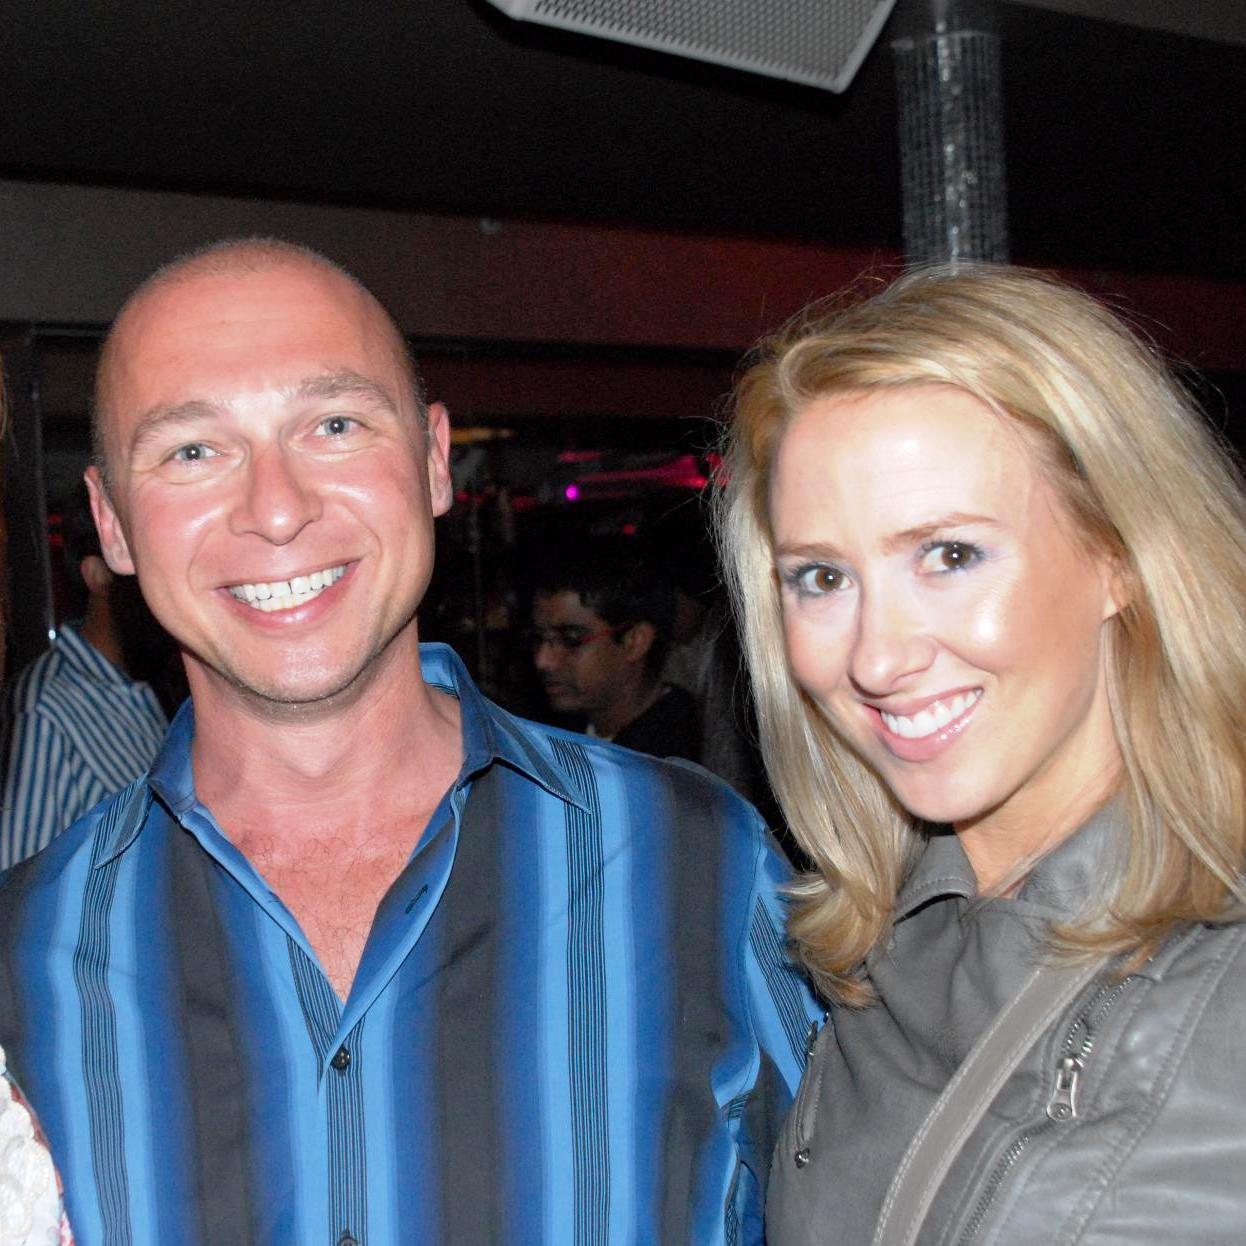 Tim Ash and Jessica Lee